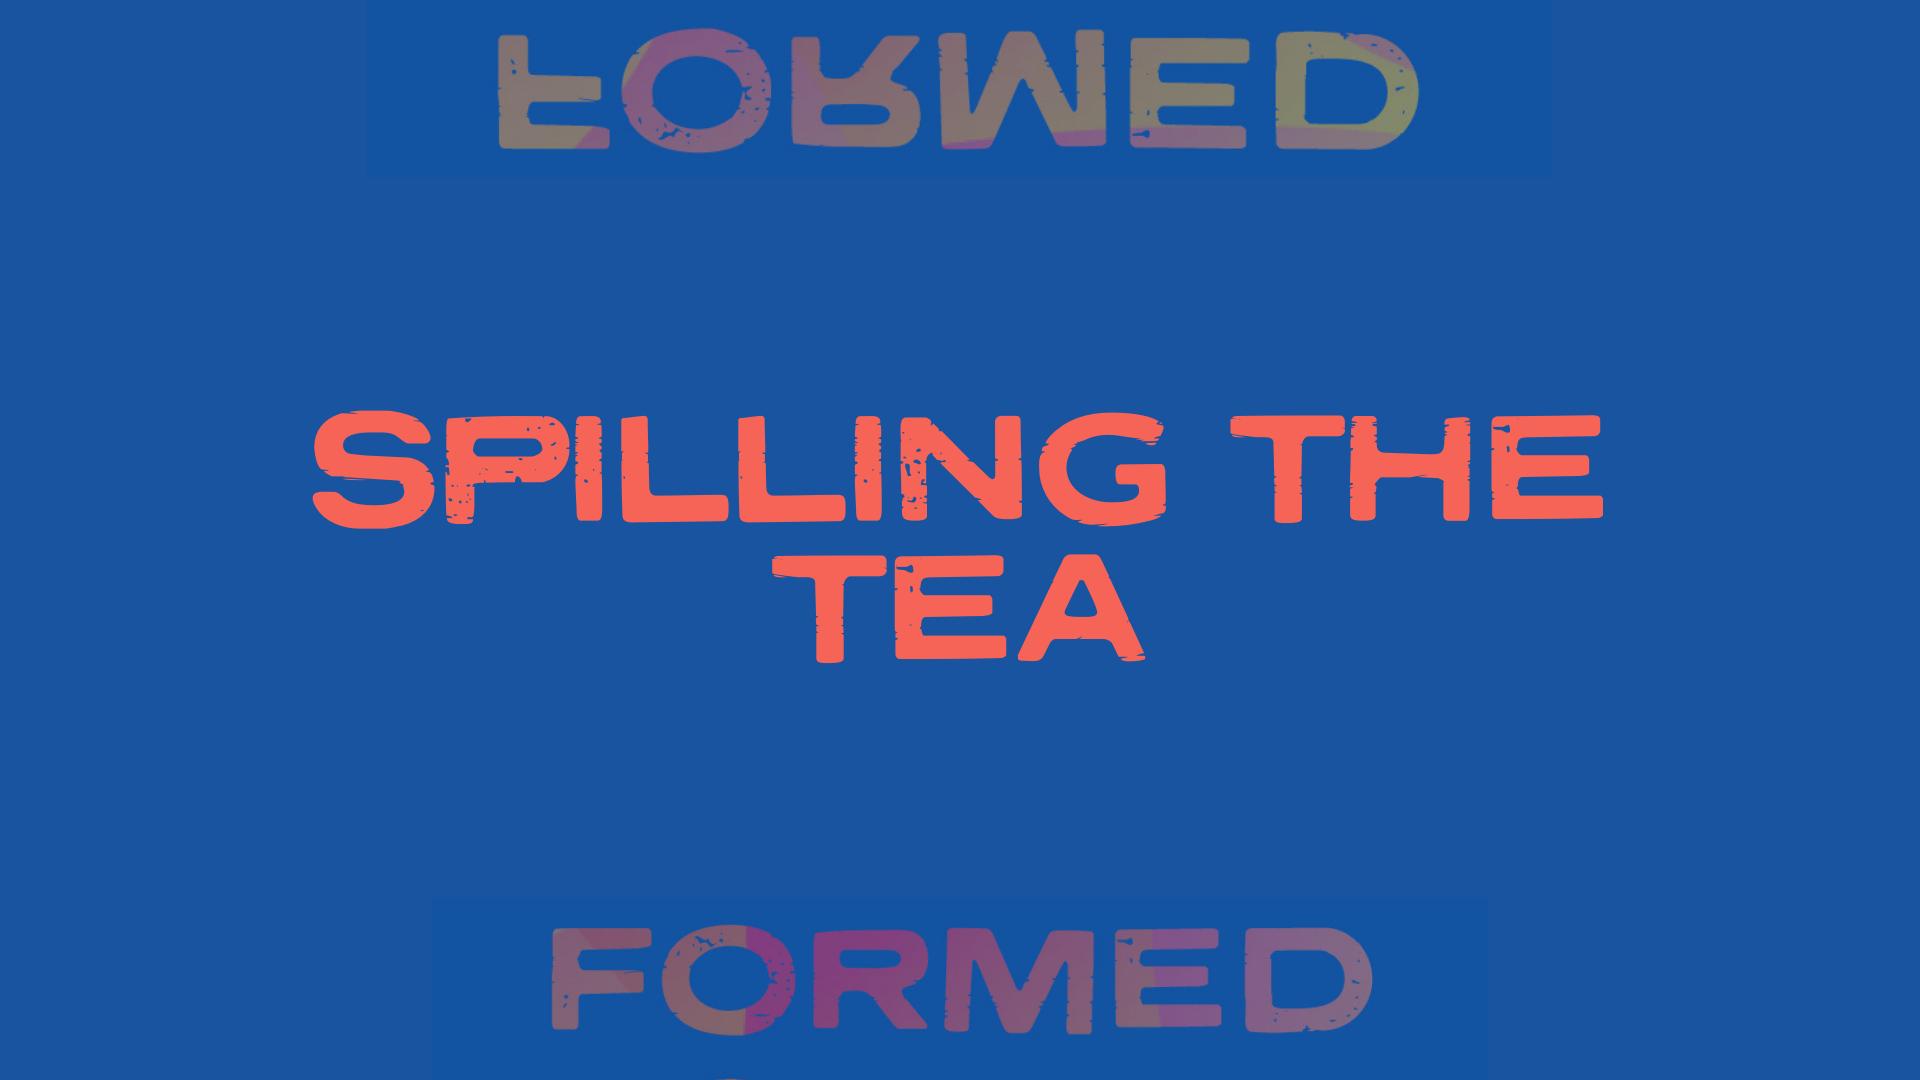 Spilling the Tea